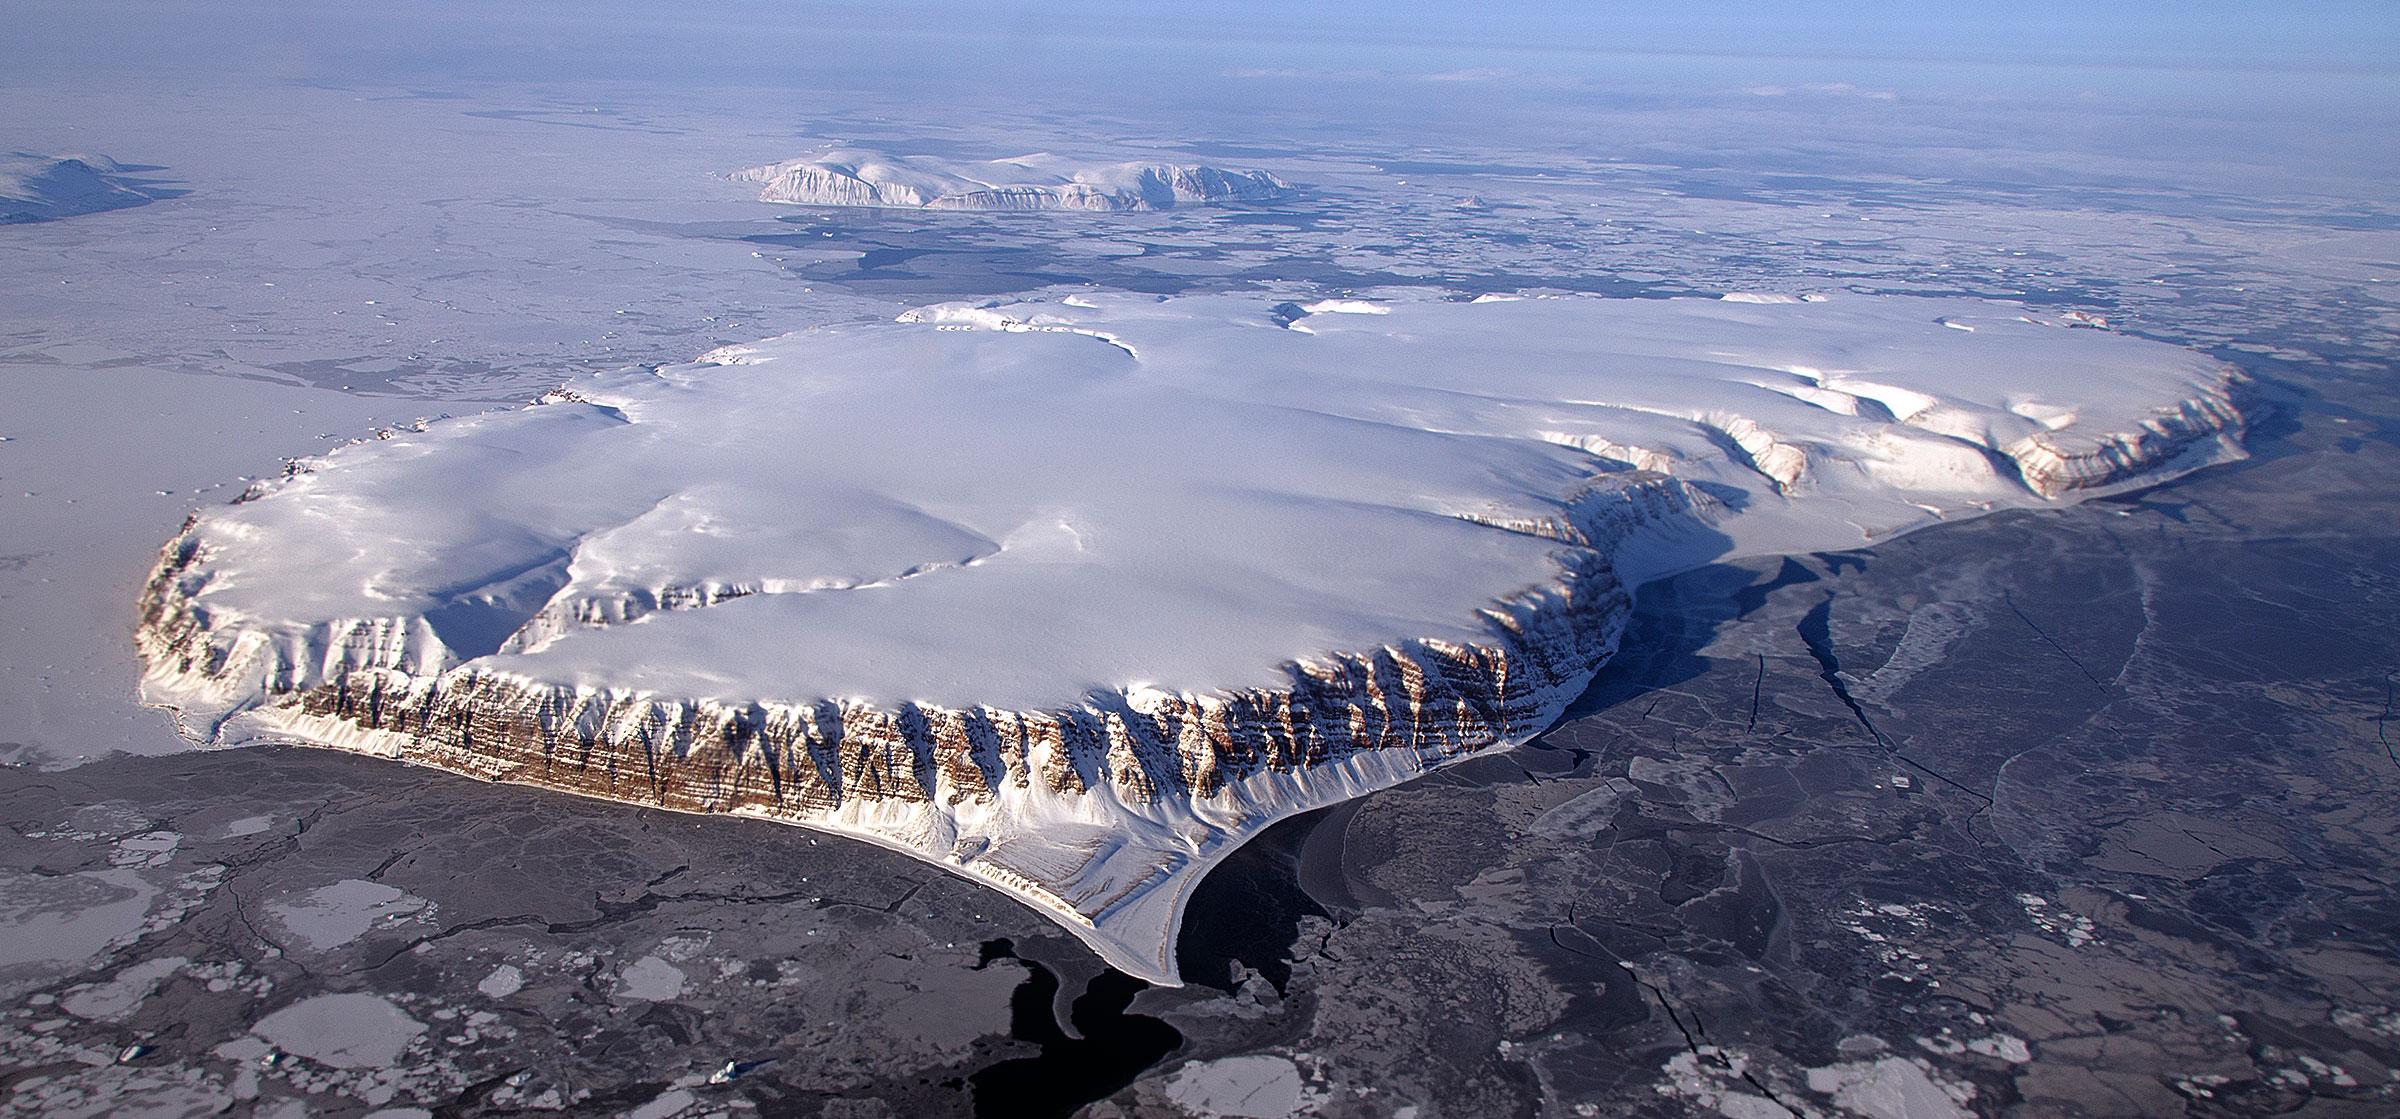 Арктическая-съемка-228669